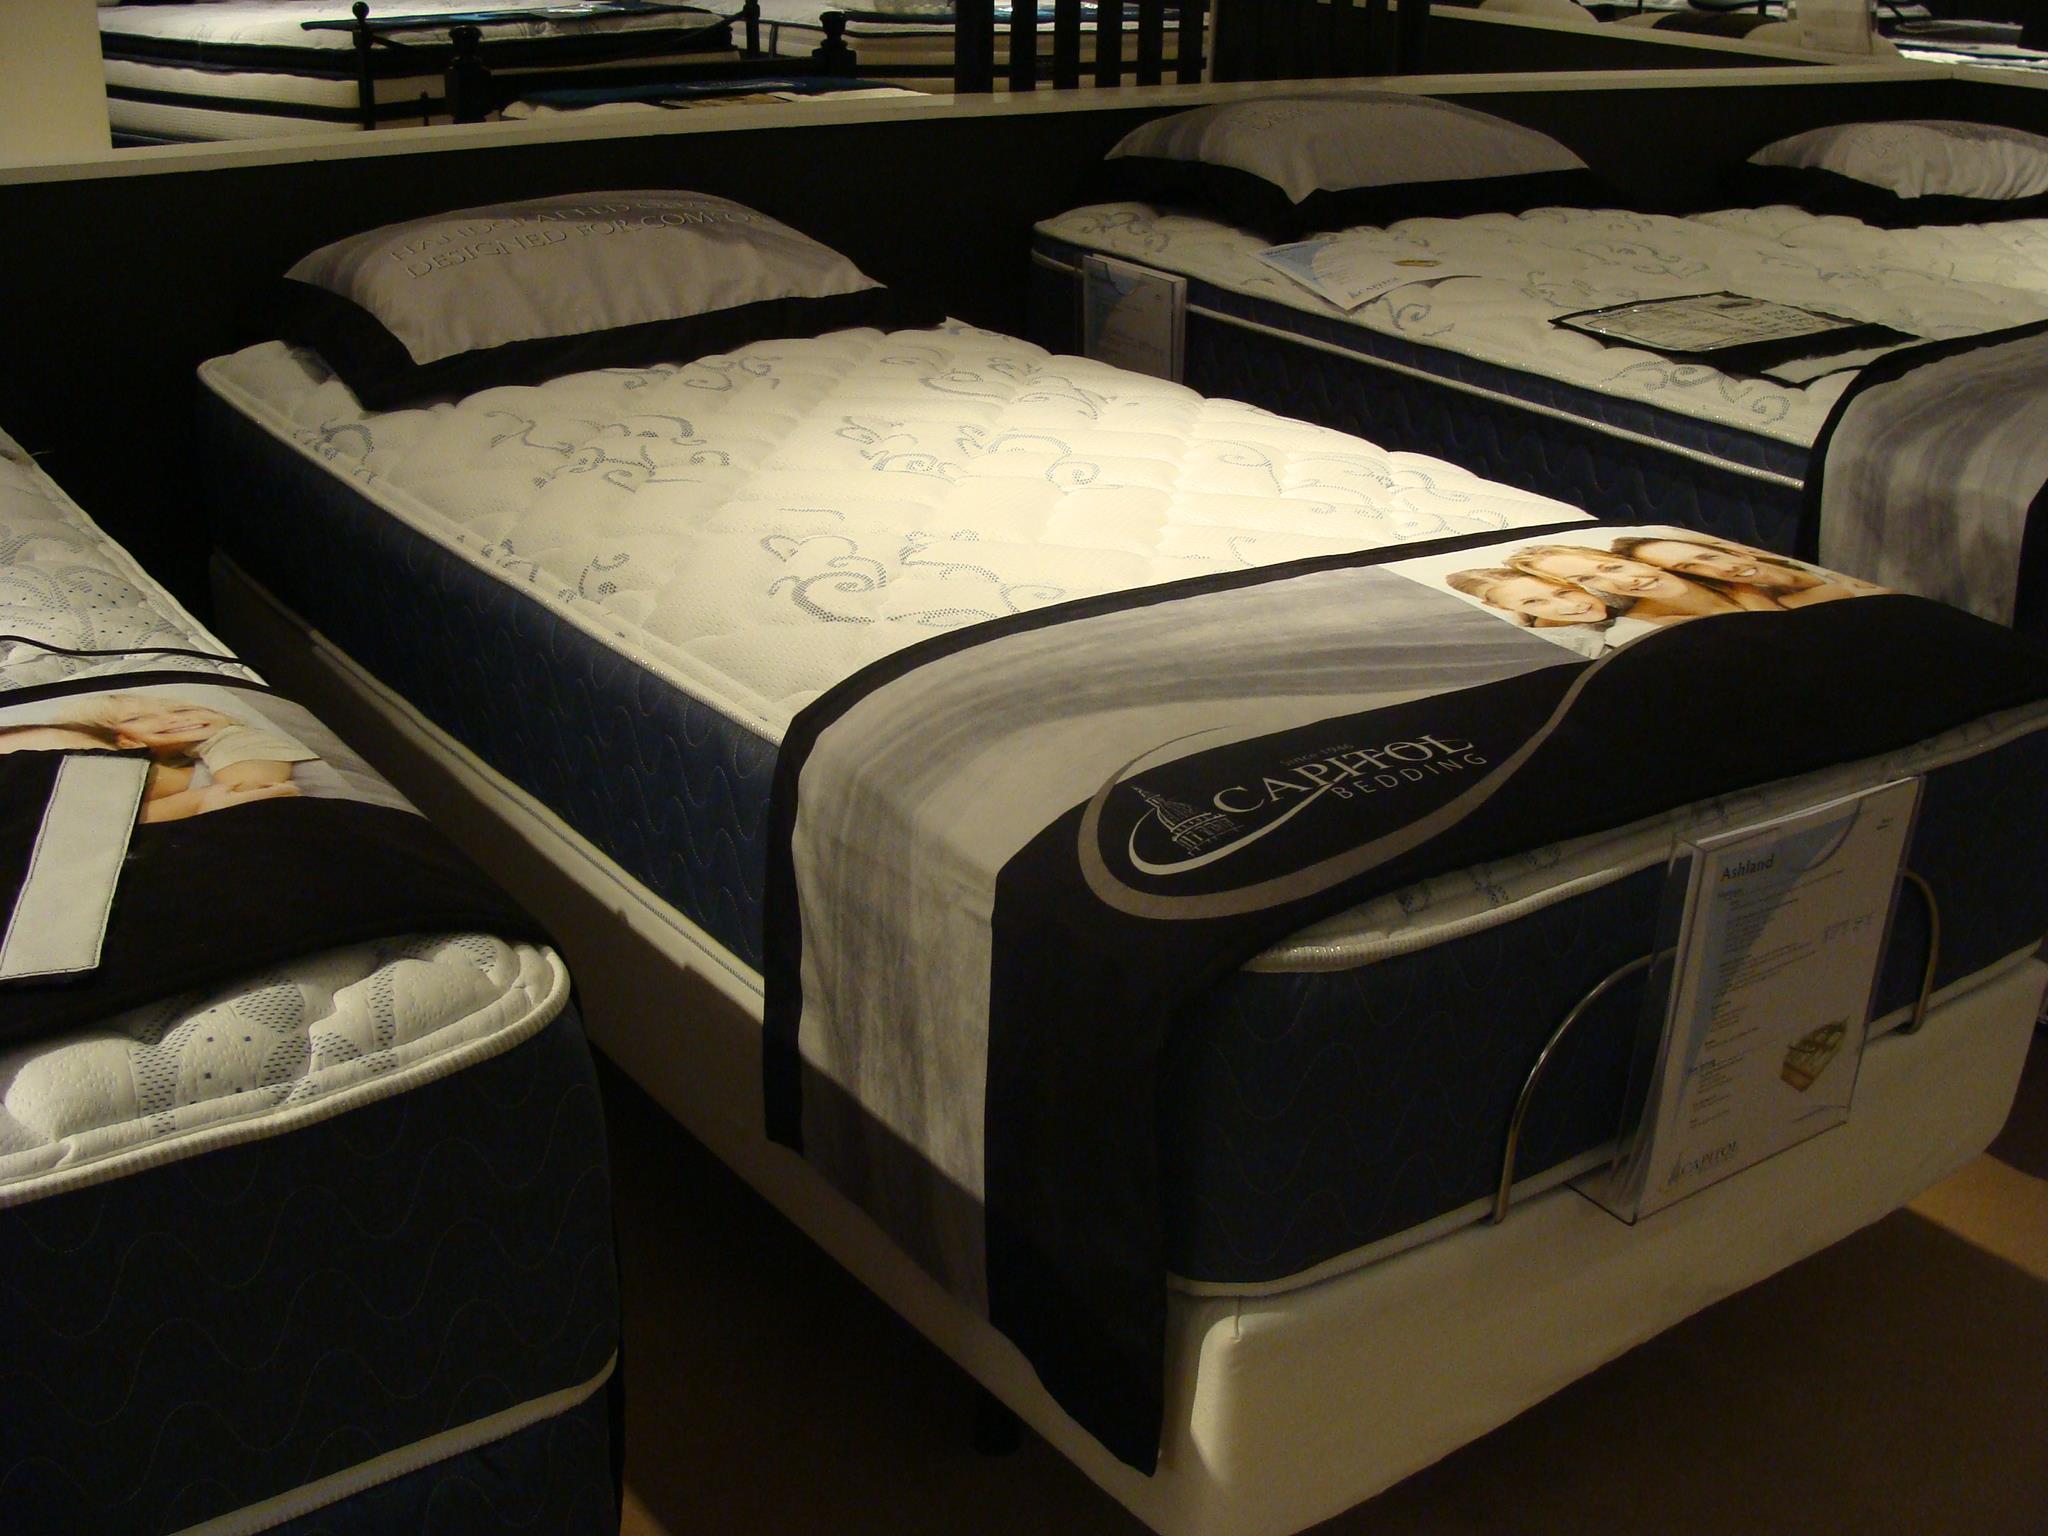 Capitol Bedding Ashland Full Mattress Set - Item Number: VertiCoil-F+SFH-F